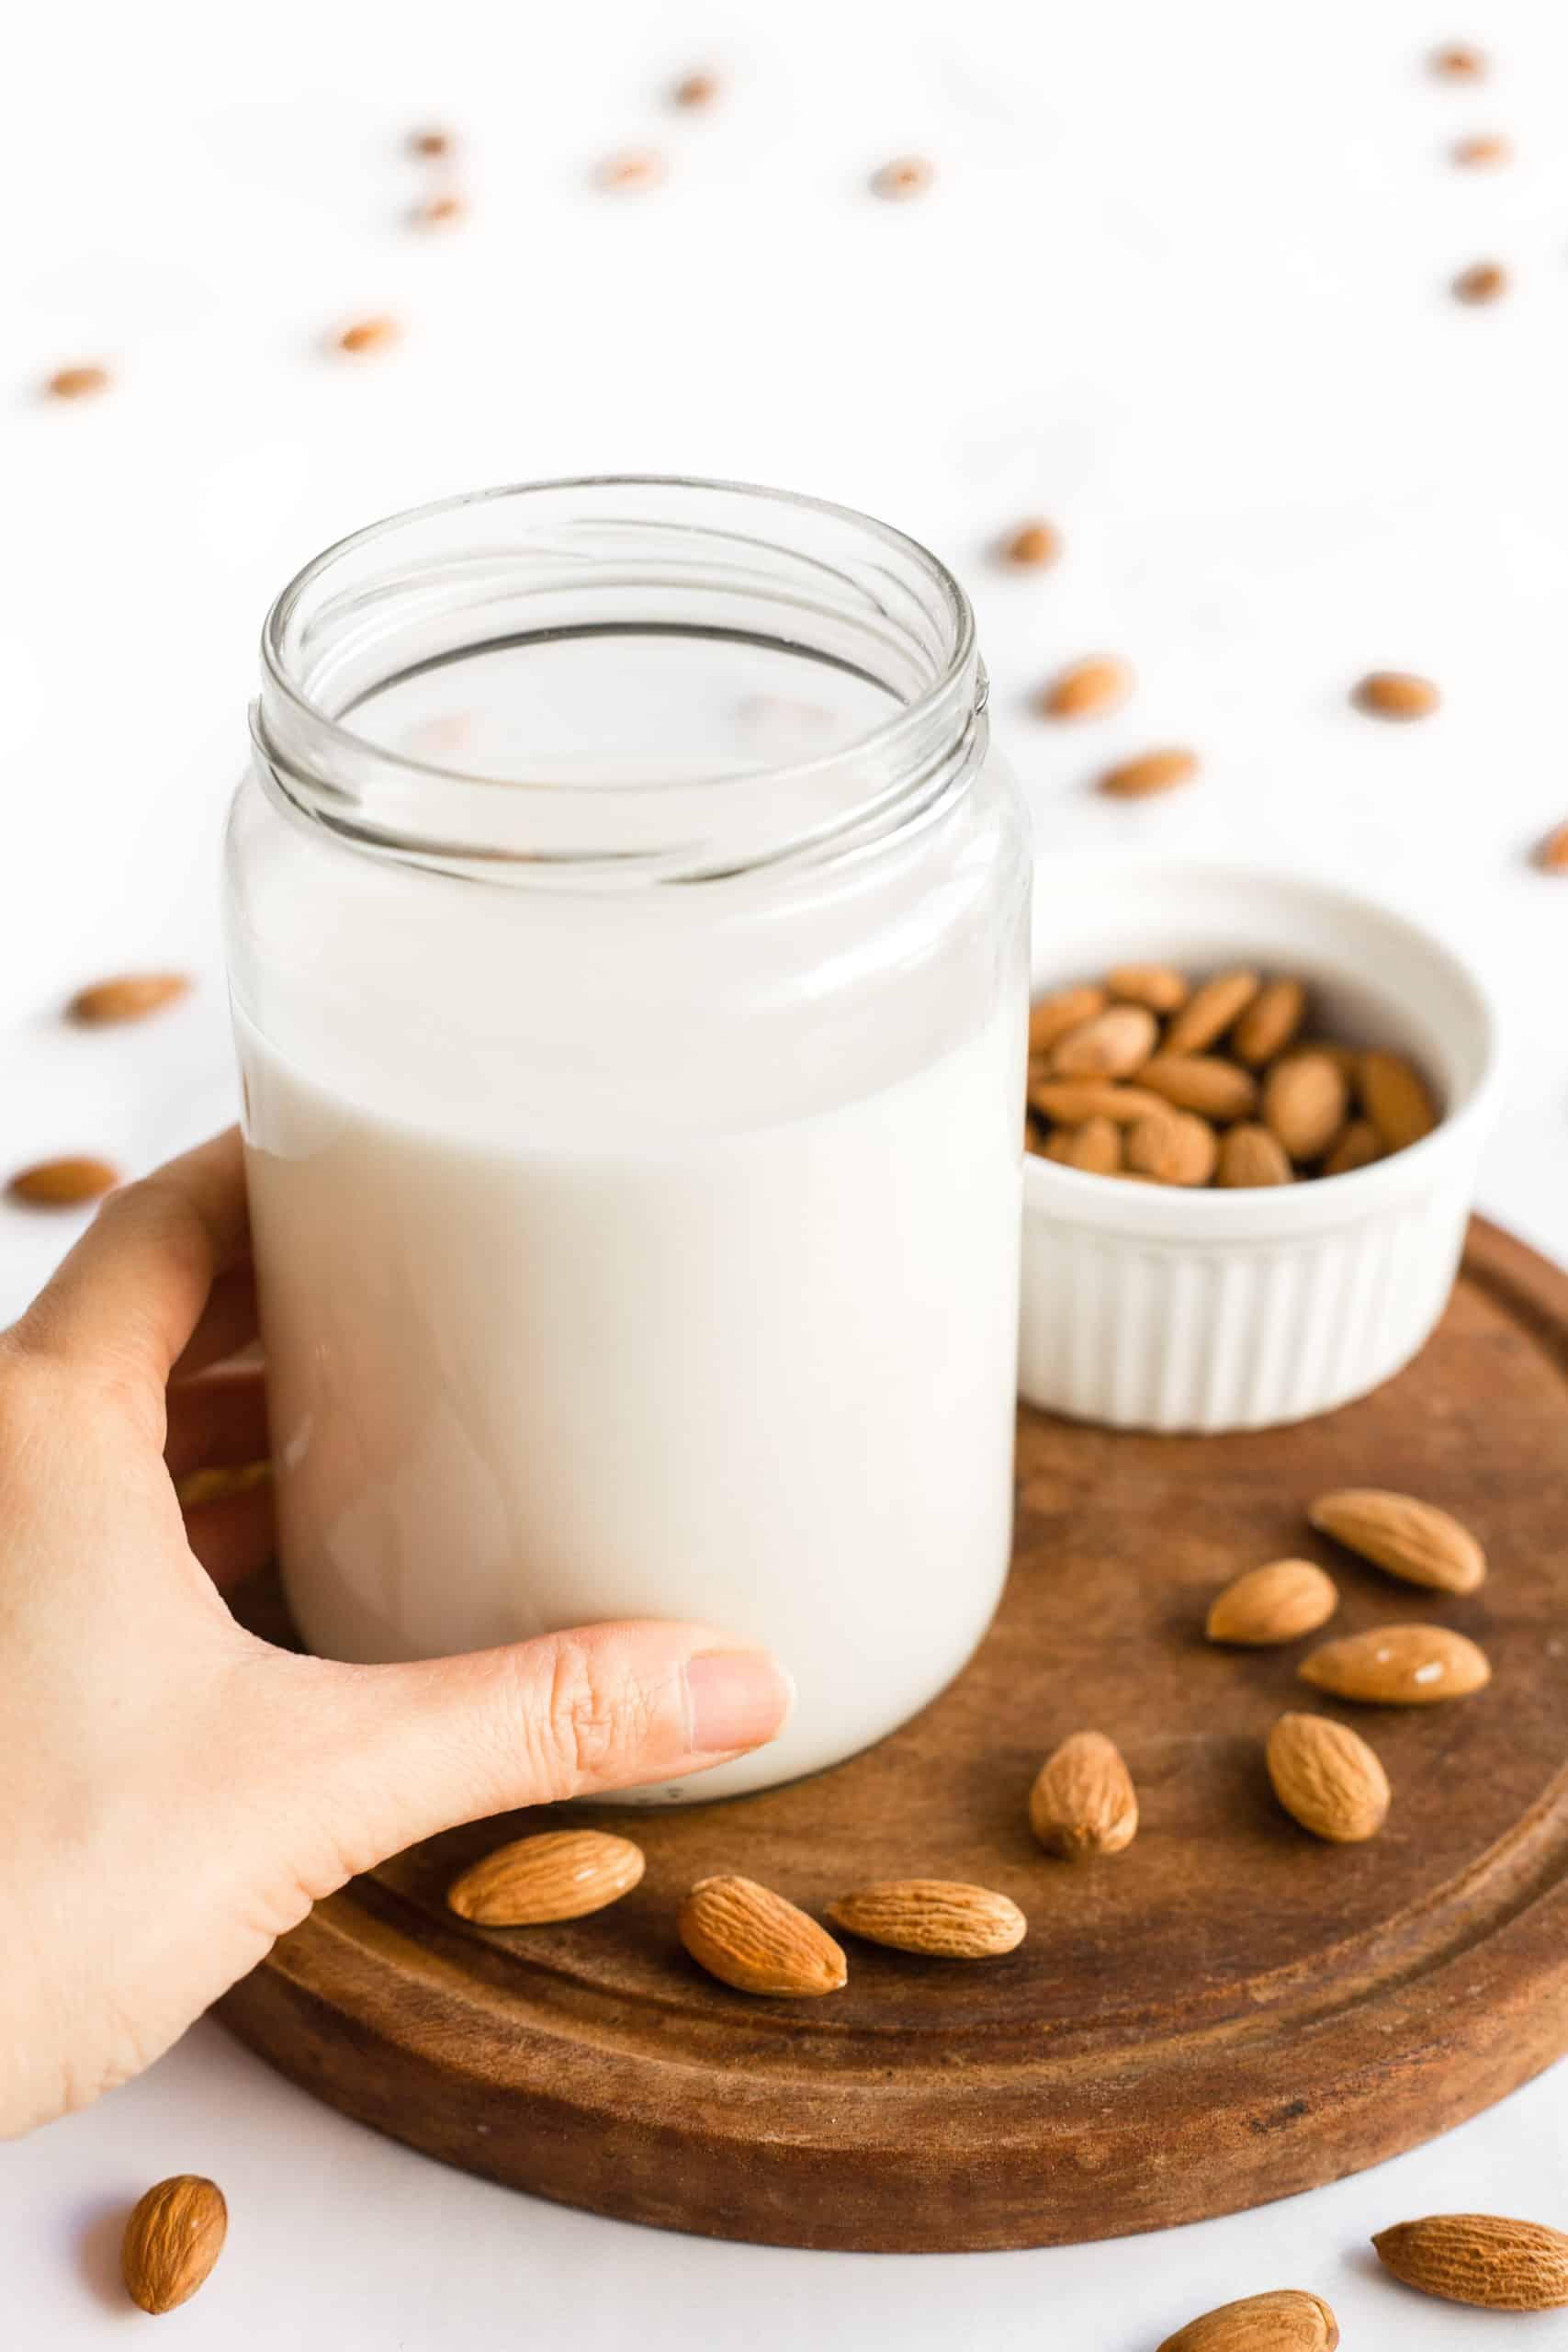 Hand holding a jar of homemade almond milk.